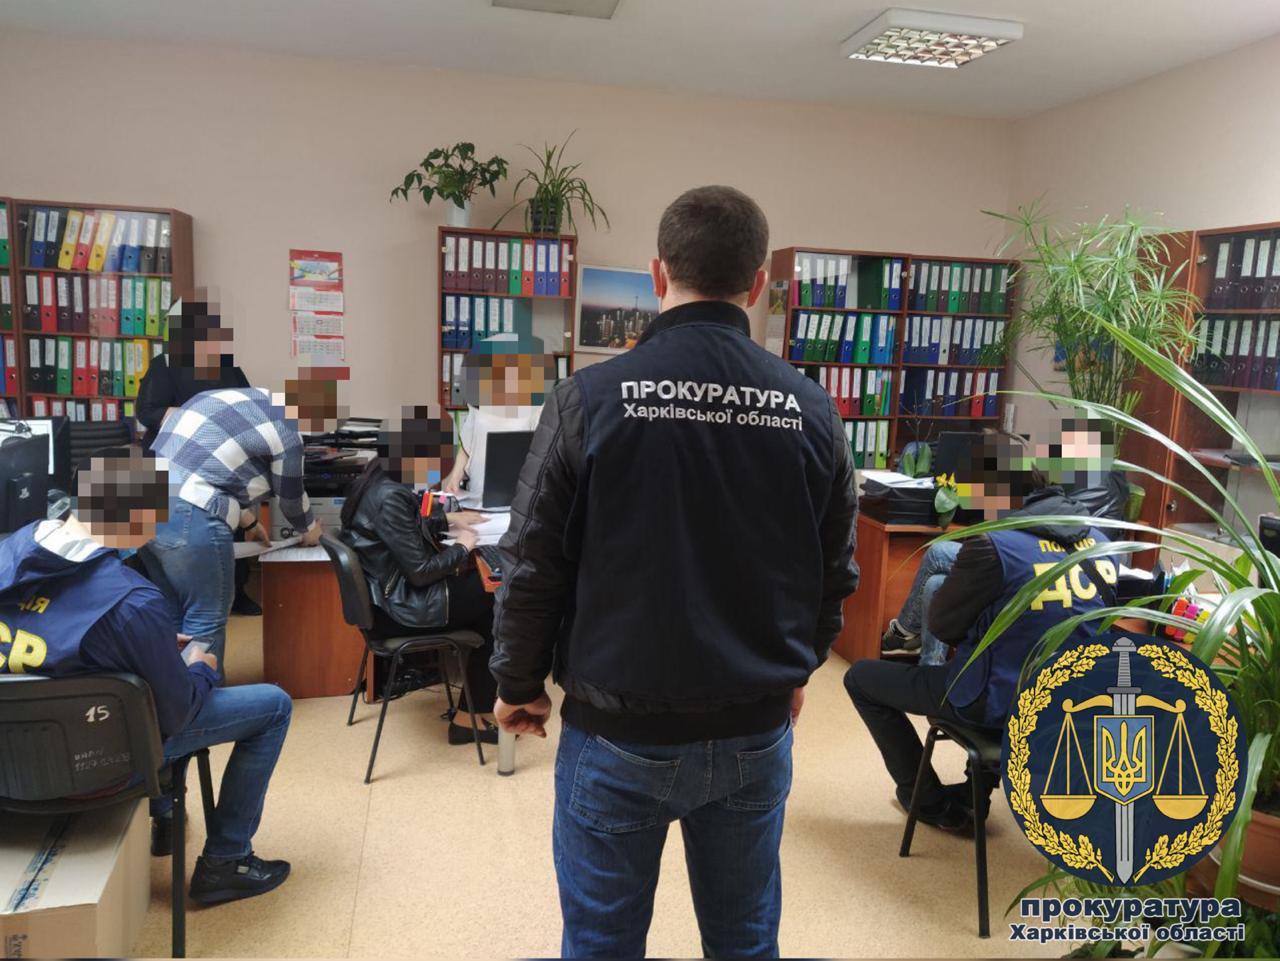 Харьковская прокуратура (khar.gp.gov.ua)